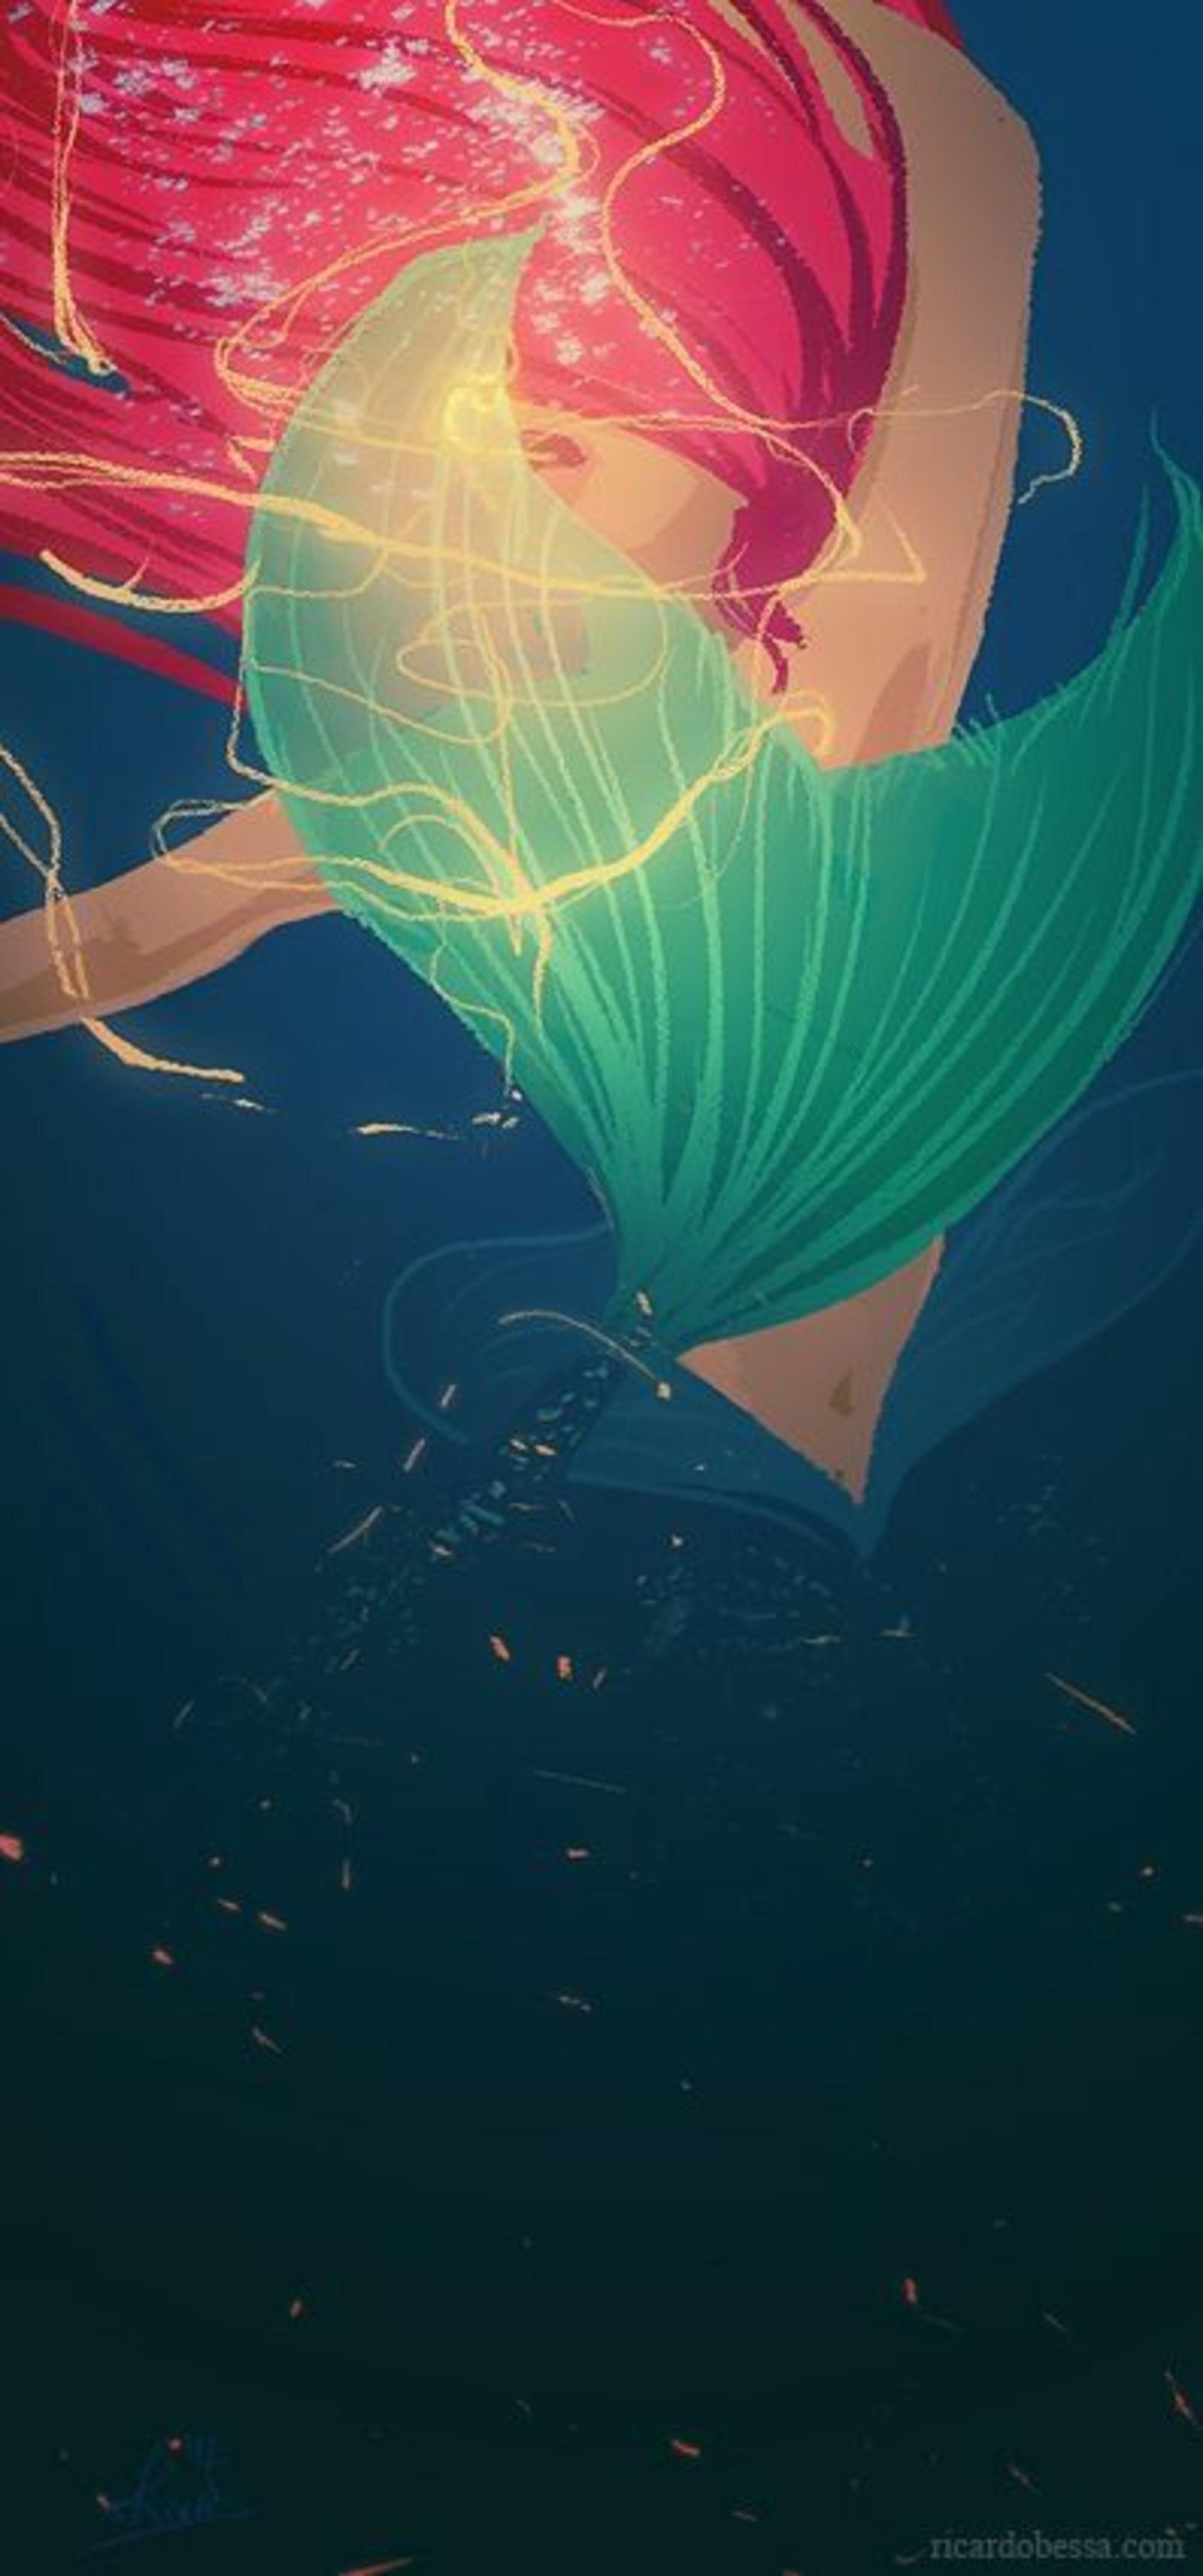 Wallpaper Little Mermaid Posted By Ryan Johnson